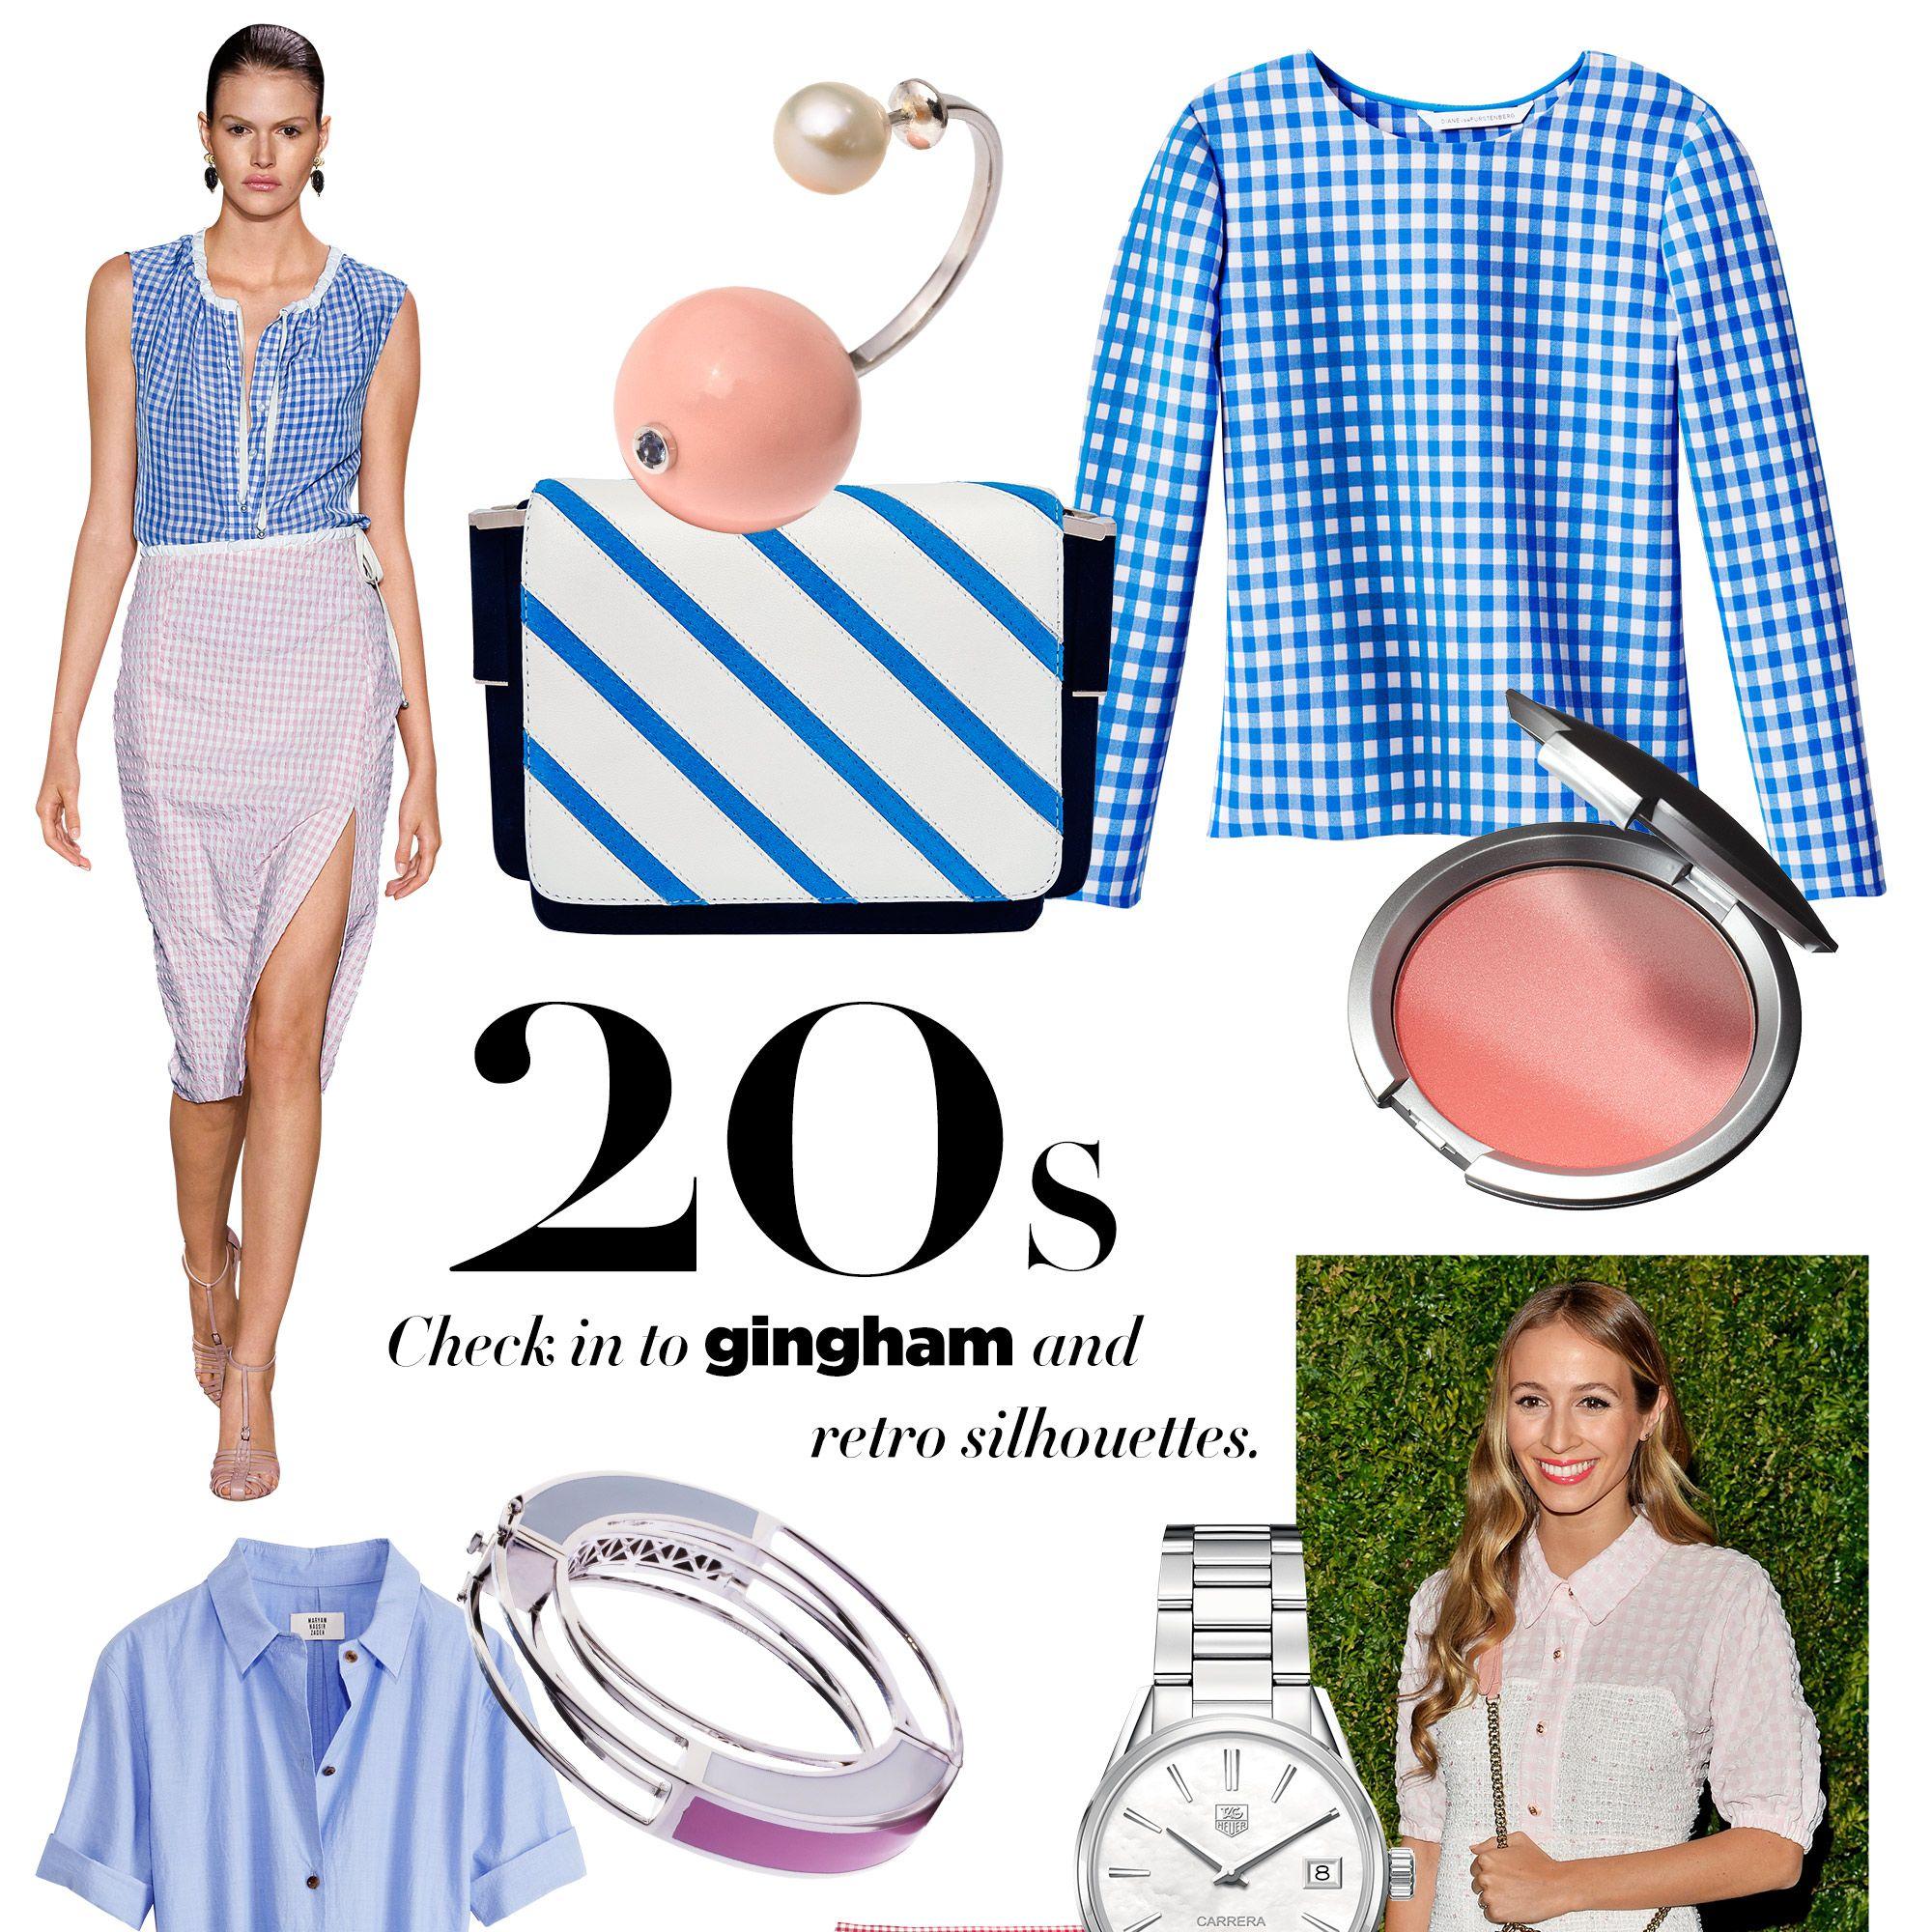 "<strong>Delfina Delettrez</strong> earring, $880, <a href=""https://www.openingceremony.us/products.asp?menuid=2&amp&#x3B;designerid=221&amp&#x3B;view=all"" target=""_blank"">openingceremony.us</a>&#x3B; <strong>Diane von Furstenberg</strong> top, $298,&nbsp&#x3B;<a href=""http://www.dvf.com/designer-clothing/tops/"" target=""_blank"">dvf.com</a>&#x3B; <strong>Emanuel Ungaro</strong> bag, $1,495, Laura Gambucci, La Jolla, CA&#x3B; 858-551-0214&#x3B; <strong>IT Cosmetics&nbsp&#x3B;</strong>CC+ Radiance Ombre Blush, $24, <a href=""http://www.itcosmetics.com/cc-r-radiance-ombre-blush?utm_source=google_shopping&amp&#x3B;gclid=Cj0KEQiA6ounBRCq0LKBjKGgysEBEiQAZmpvAwSZhGssBPfRmNTM7SChJQsx0WjddS5lz_7aEKt1NGcaAhMQ8P8HAQ"" target=""_blank"">itcosmetics.com</a>&#x3B; <strong>Maryam Nassir Zadeh</strong> dress, $598, Black Parrot, Portland, ME&#x3B; 207-221-6991&#x3B; <strong>Michael Kors</strong> skirt, $575, <a href=""http://shop.harpersbazaar.com/designers/michael-kors/gingham-pencil-skirt/"" target=""_blank"">shopBAZAAR.com</a><img src=""http://assets.hdmtools.com/images/HBZ/Shop.svg"" class=""icon shop"">&#x3B; <strong>Eddie Borgo</strong> bracelet, $350, <a href=""http://shop.harpersbazaar.com/designers/eddie-borgo/circle-frame-bracelet/"" target=""_blank"">shopBAZAAR.com</a><img src=""http://assets.hdmtools.com/images/HBZ/Shop.svg"" class=""icon shop"">&#x3B; <strong>TAG Heuer</strong> watch, $2,900, 212-230-1281&#x3B; <strong>Altuzarra</strong> sandal, $990, <a href=""http://www.fwrd.com/f/Category.jsp?search=Altuzarra"" target=""_blank"">forwardbyelysewalker.com</a>.<strong>STYLIST'S TIP&nbsp&#x3B;</strong>A futuristic bracelet makes it modern."